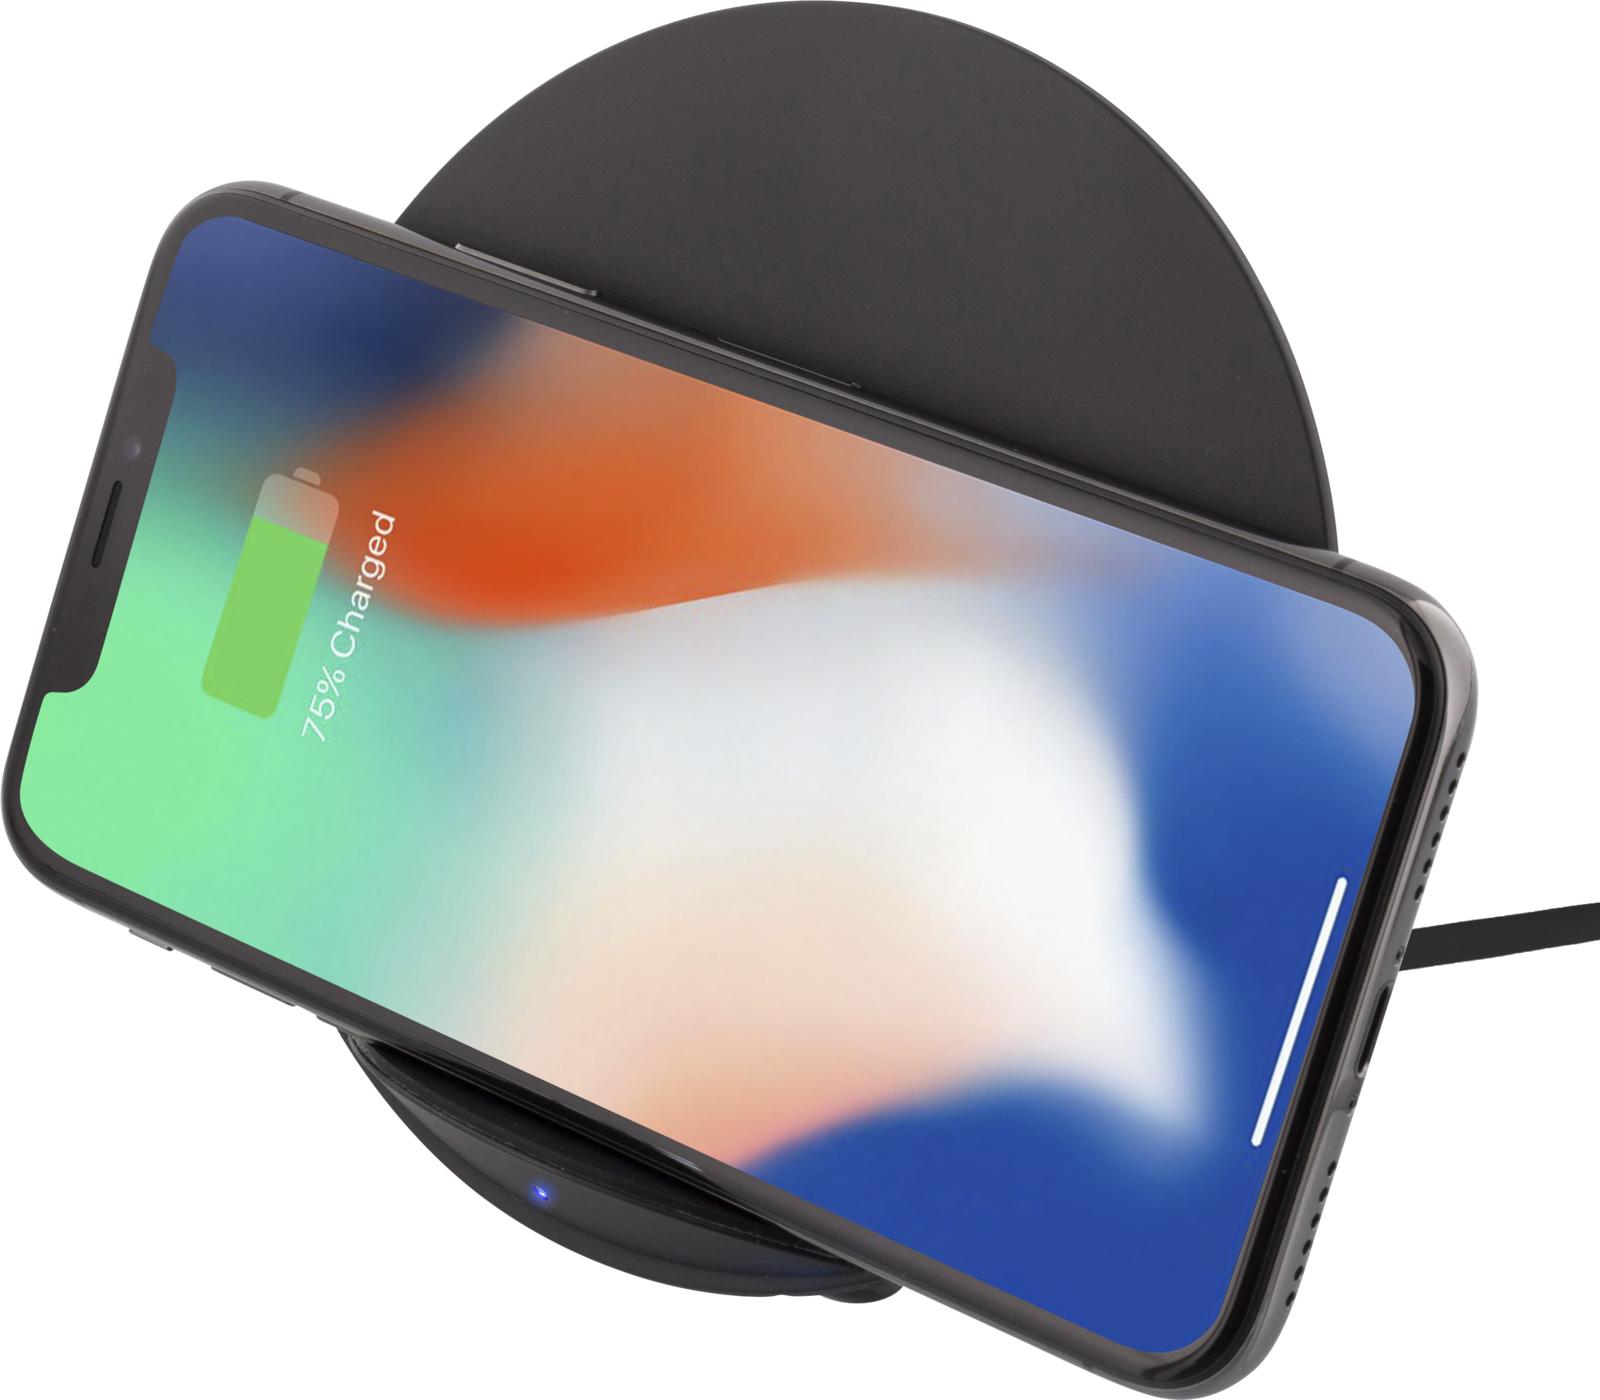 Deltaco Wireless Charger Qi 10W - Svart